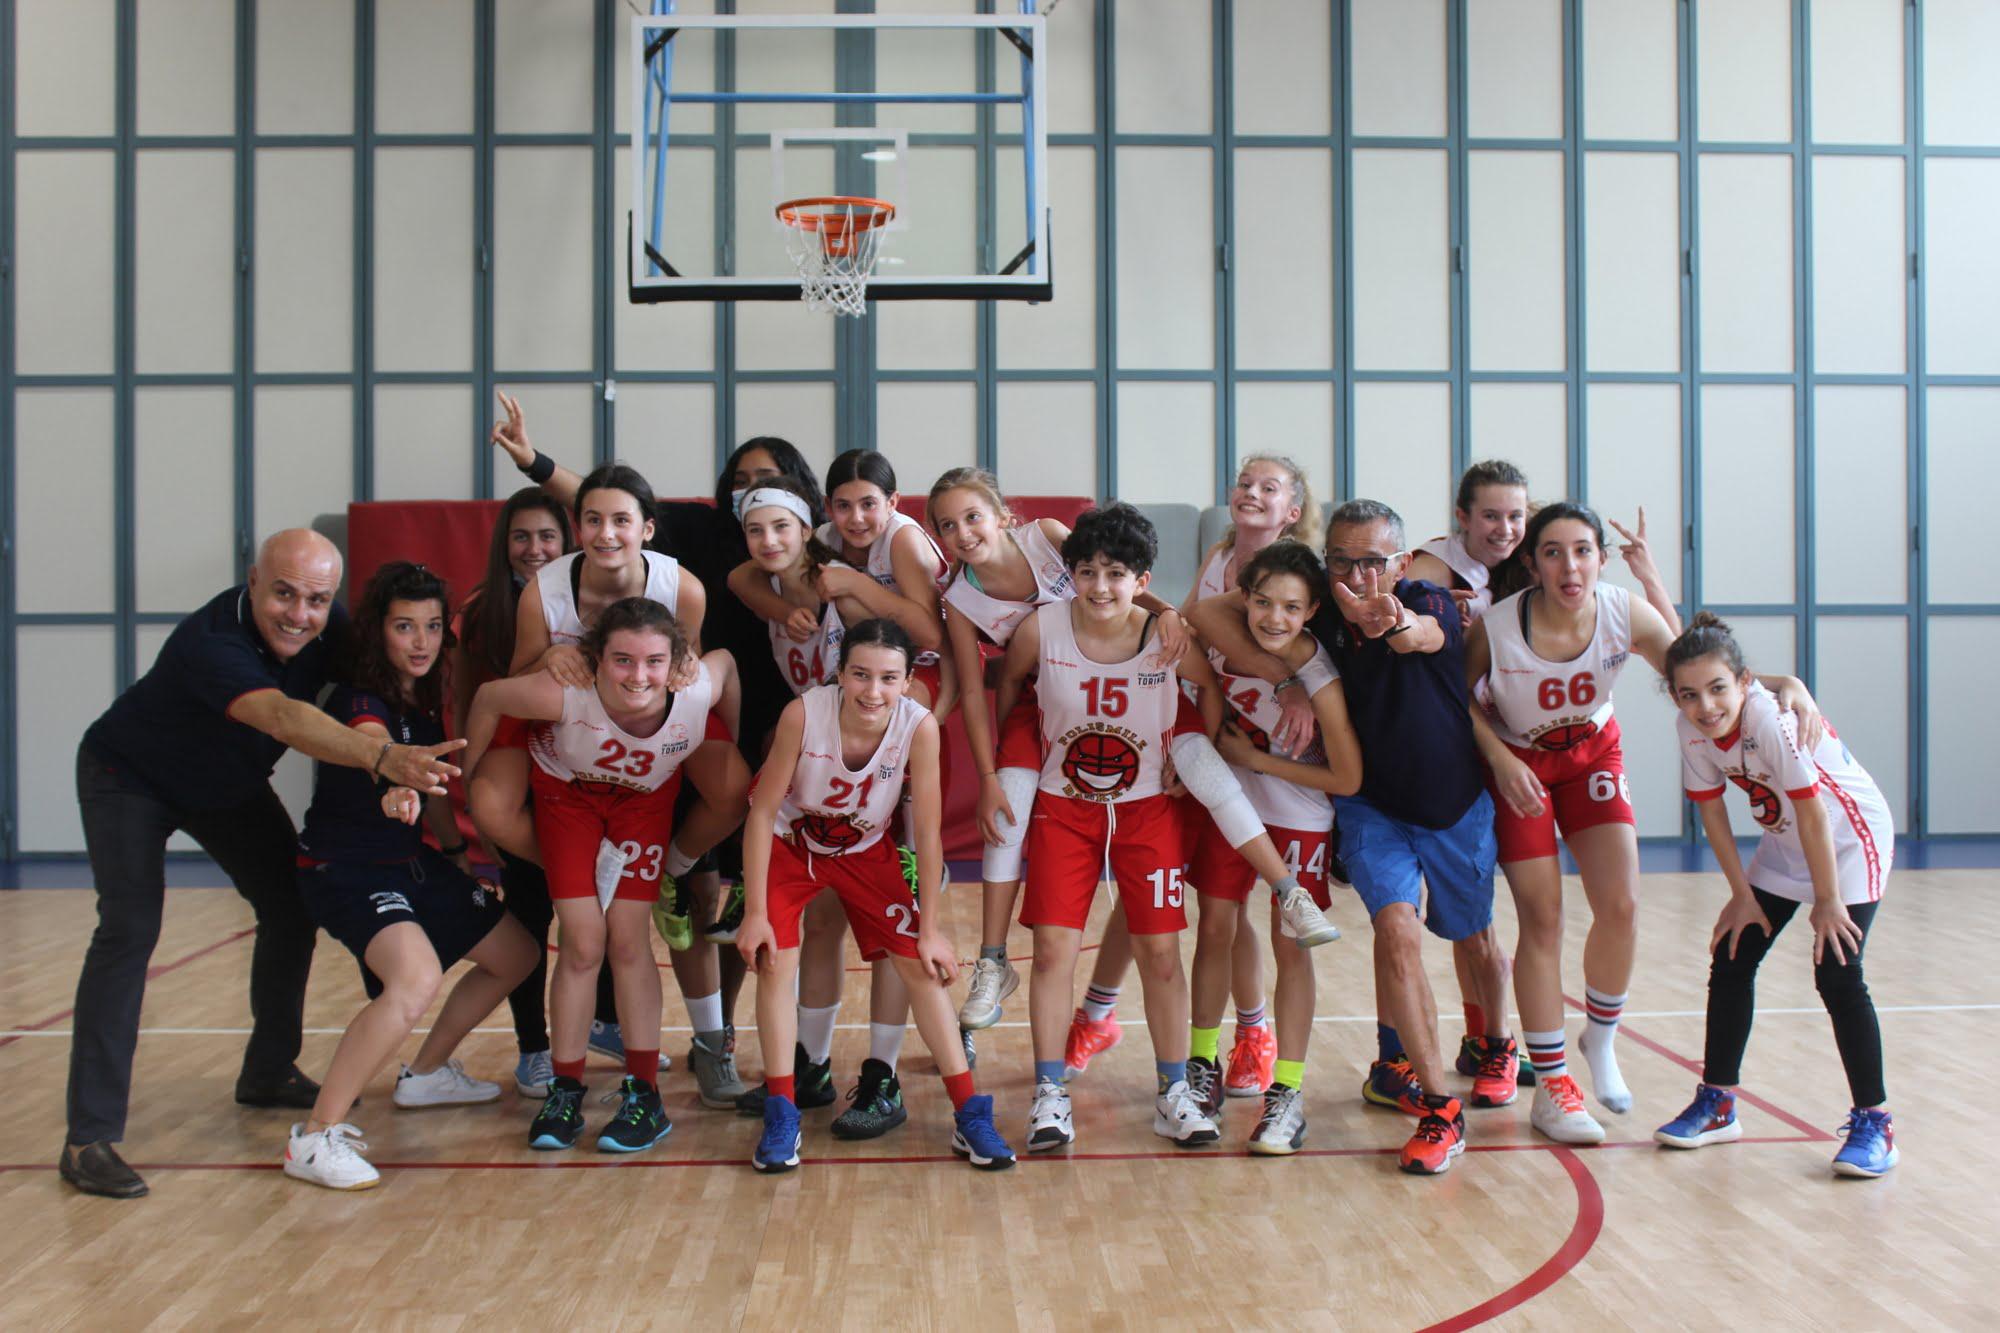 La Polismile batte Libertas e conquista la finale regionale Under 13